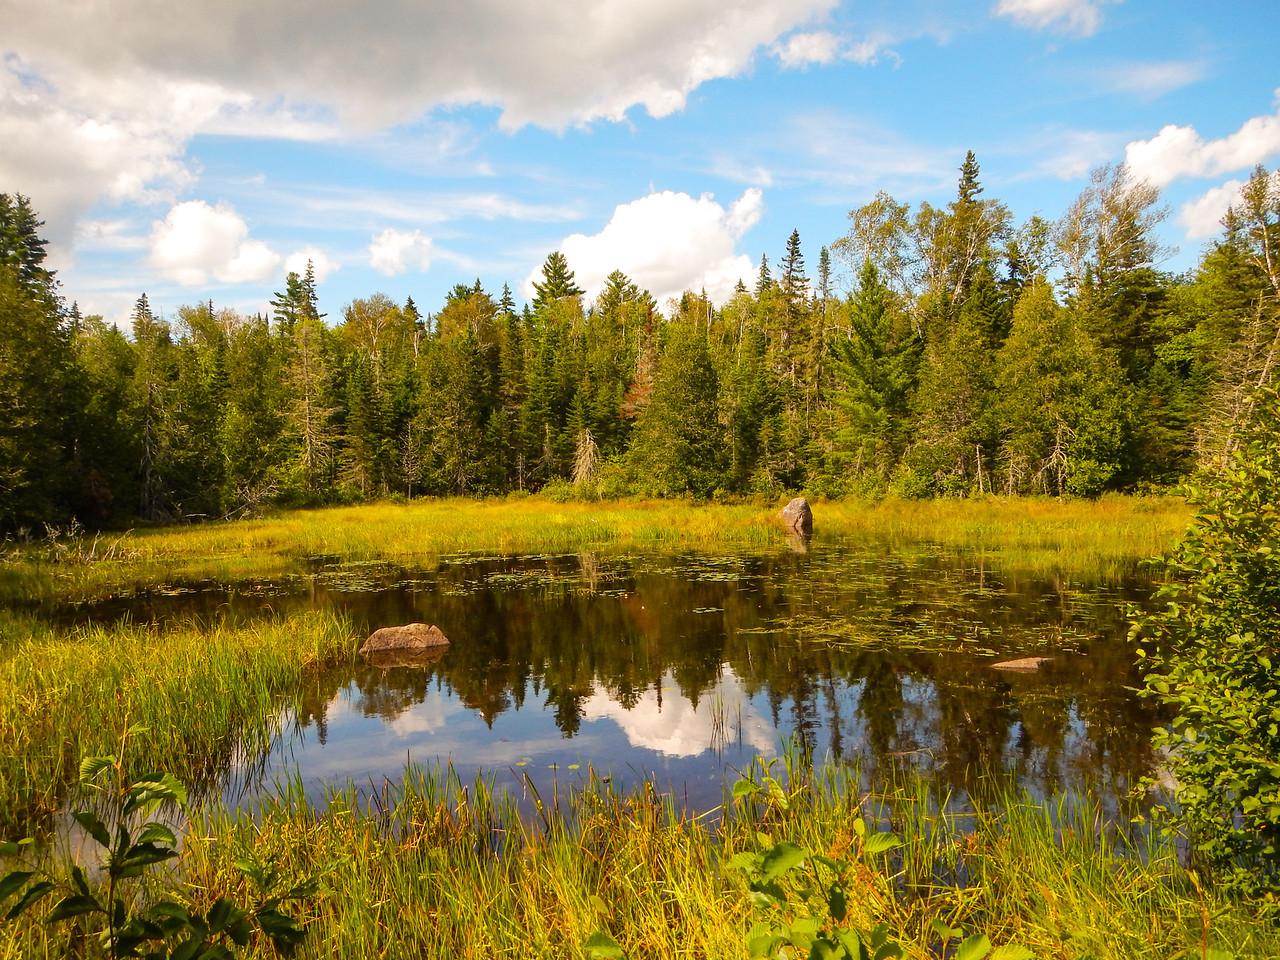 Bigelow Trail Pond